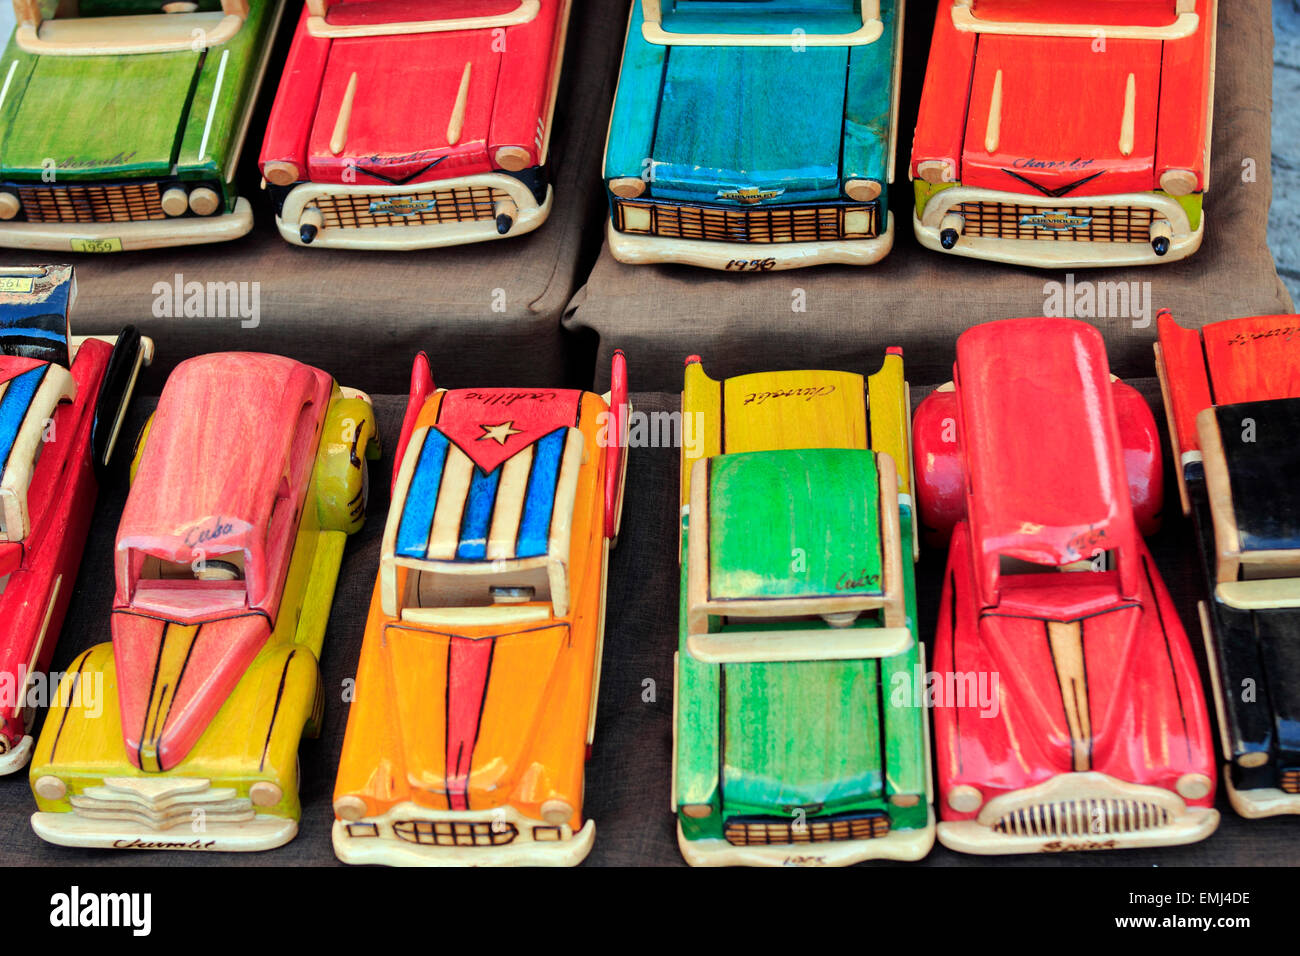 Artist made models of 1950's era American cars common in Cuba Cienfuegos Cuba - Stock Image